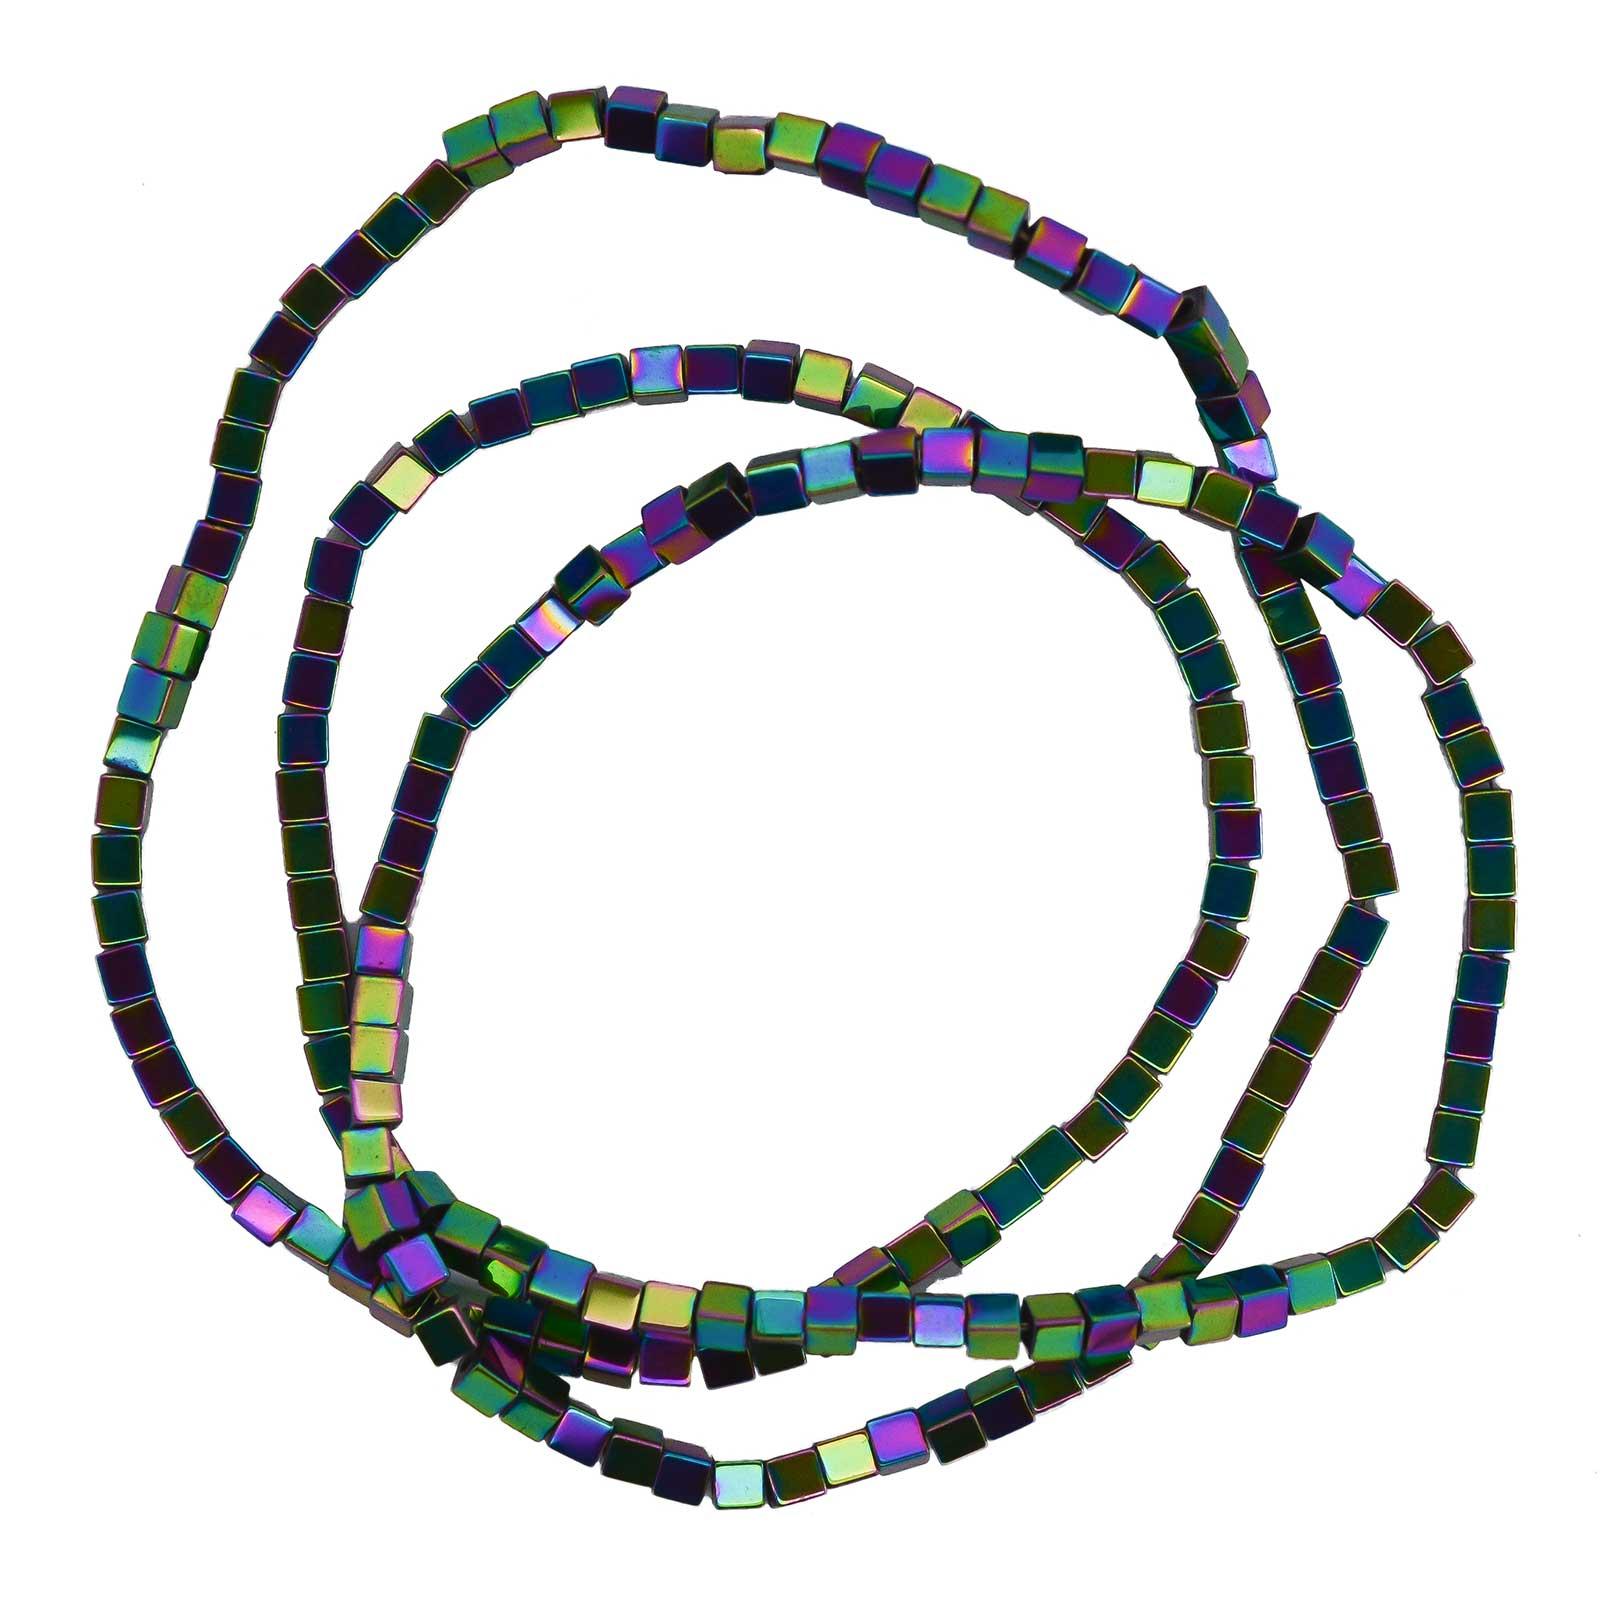 1 Strang Hämatit-Perlen Pfeile Kugel Würfel Schmuckperlen verschiedene Formen Farbwahl – Bild 8